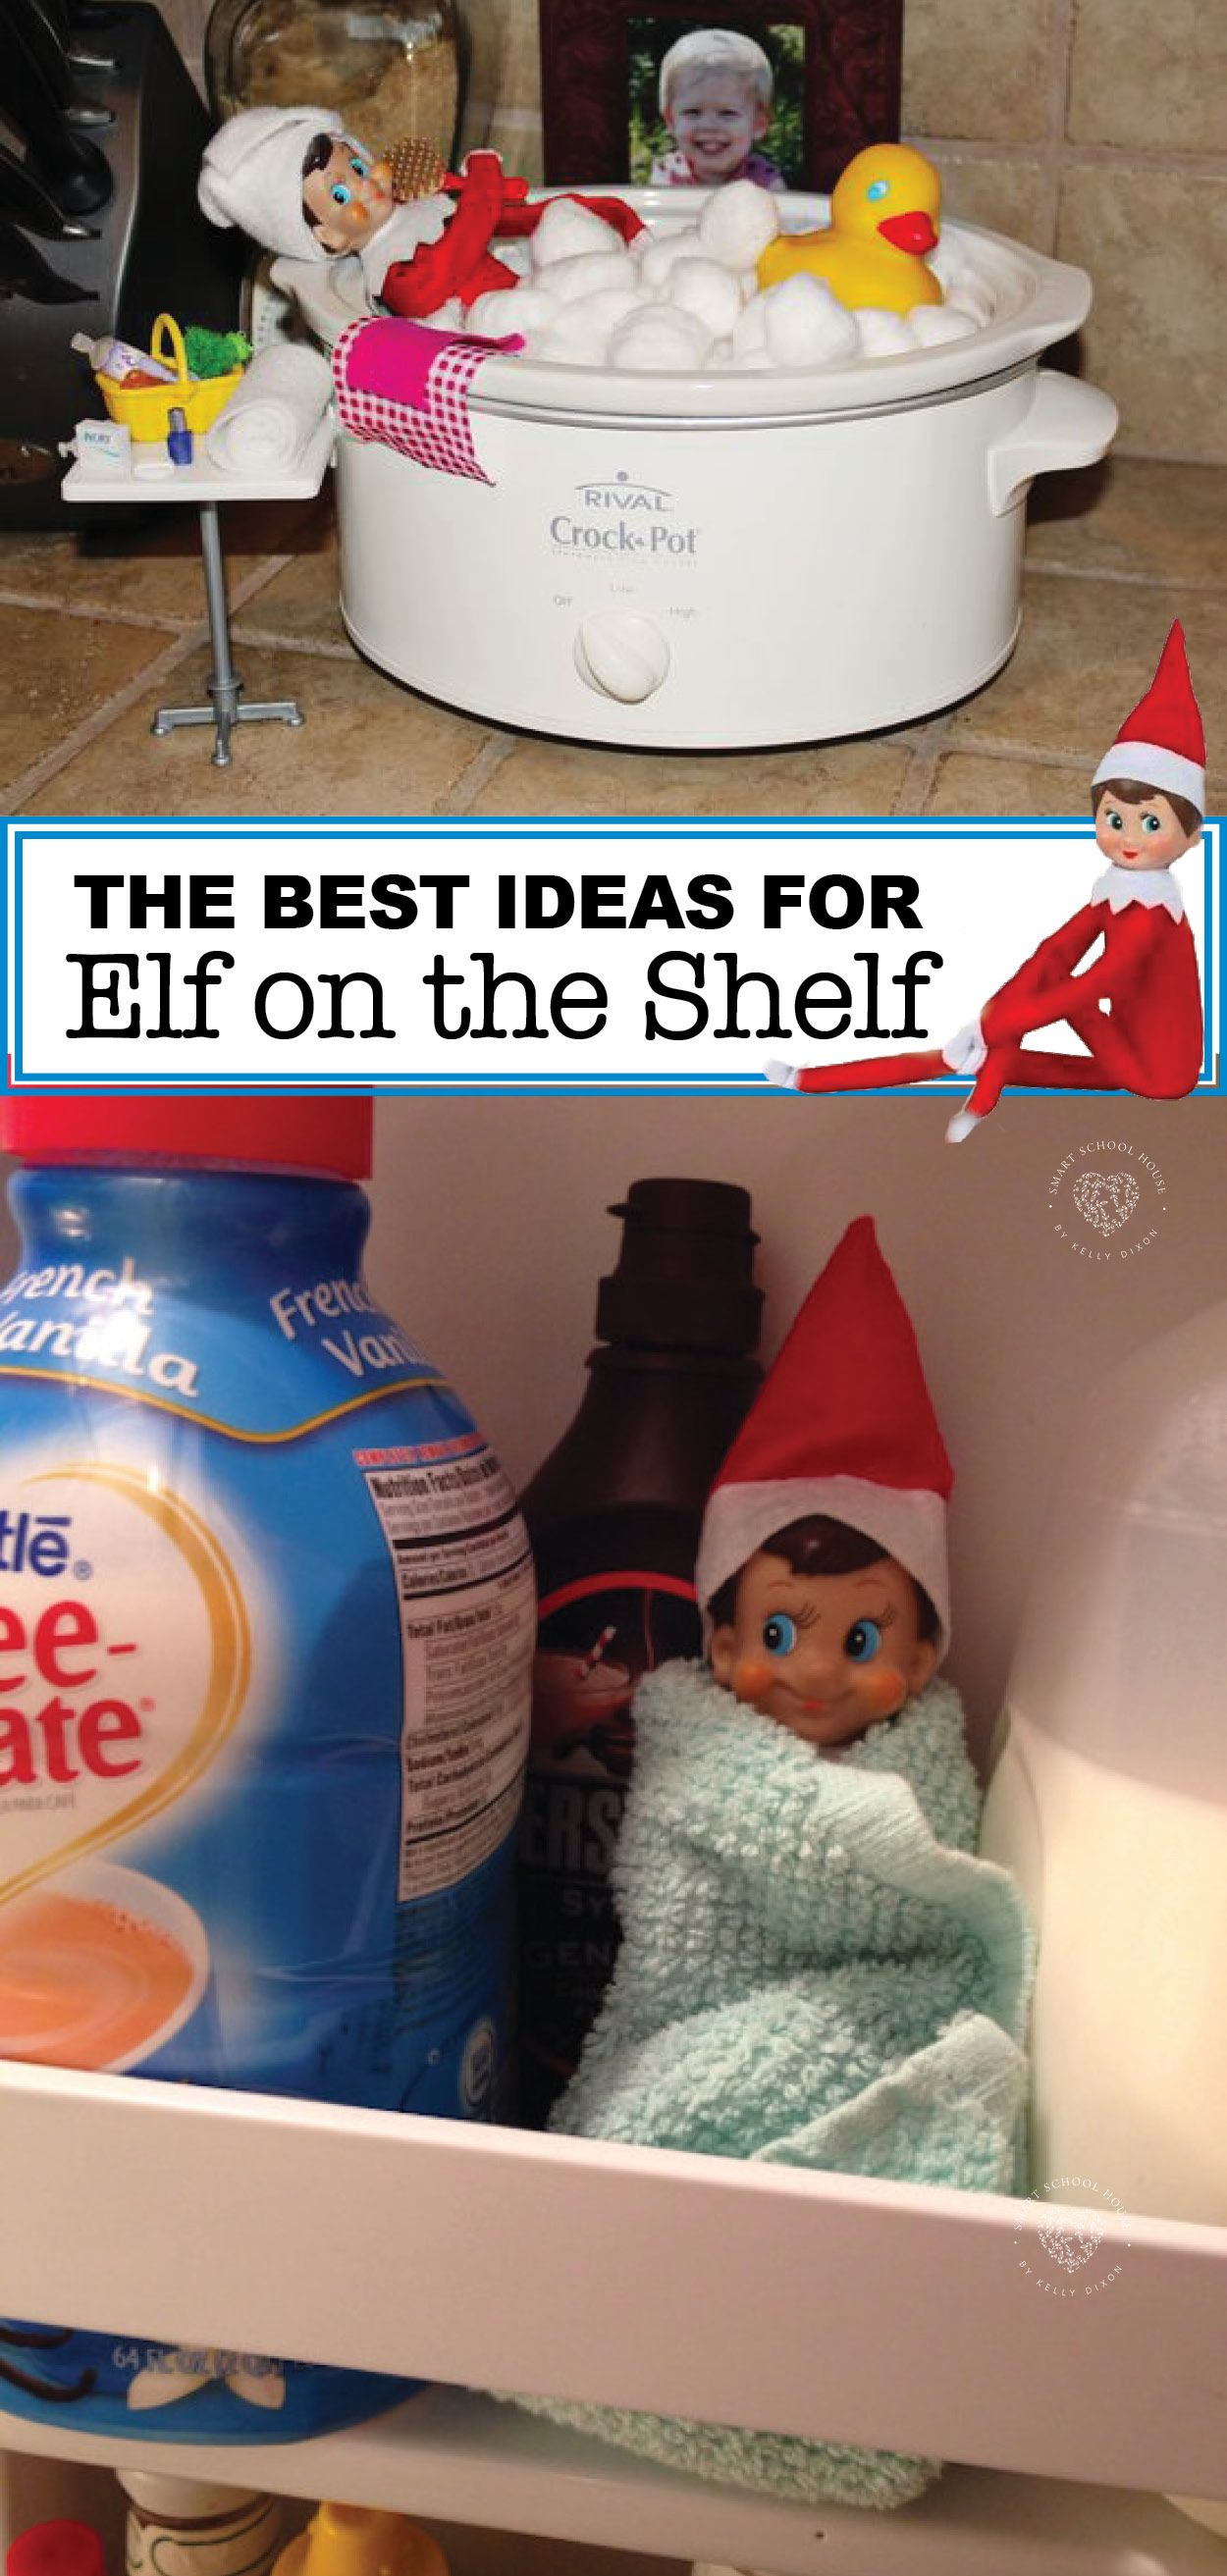 The BEST Elf on the Shelf Ideas